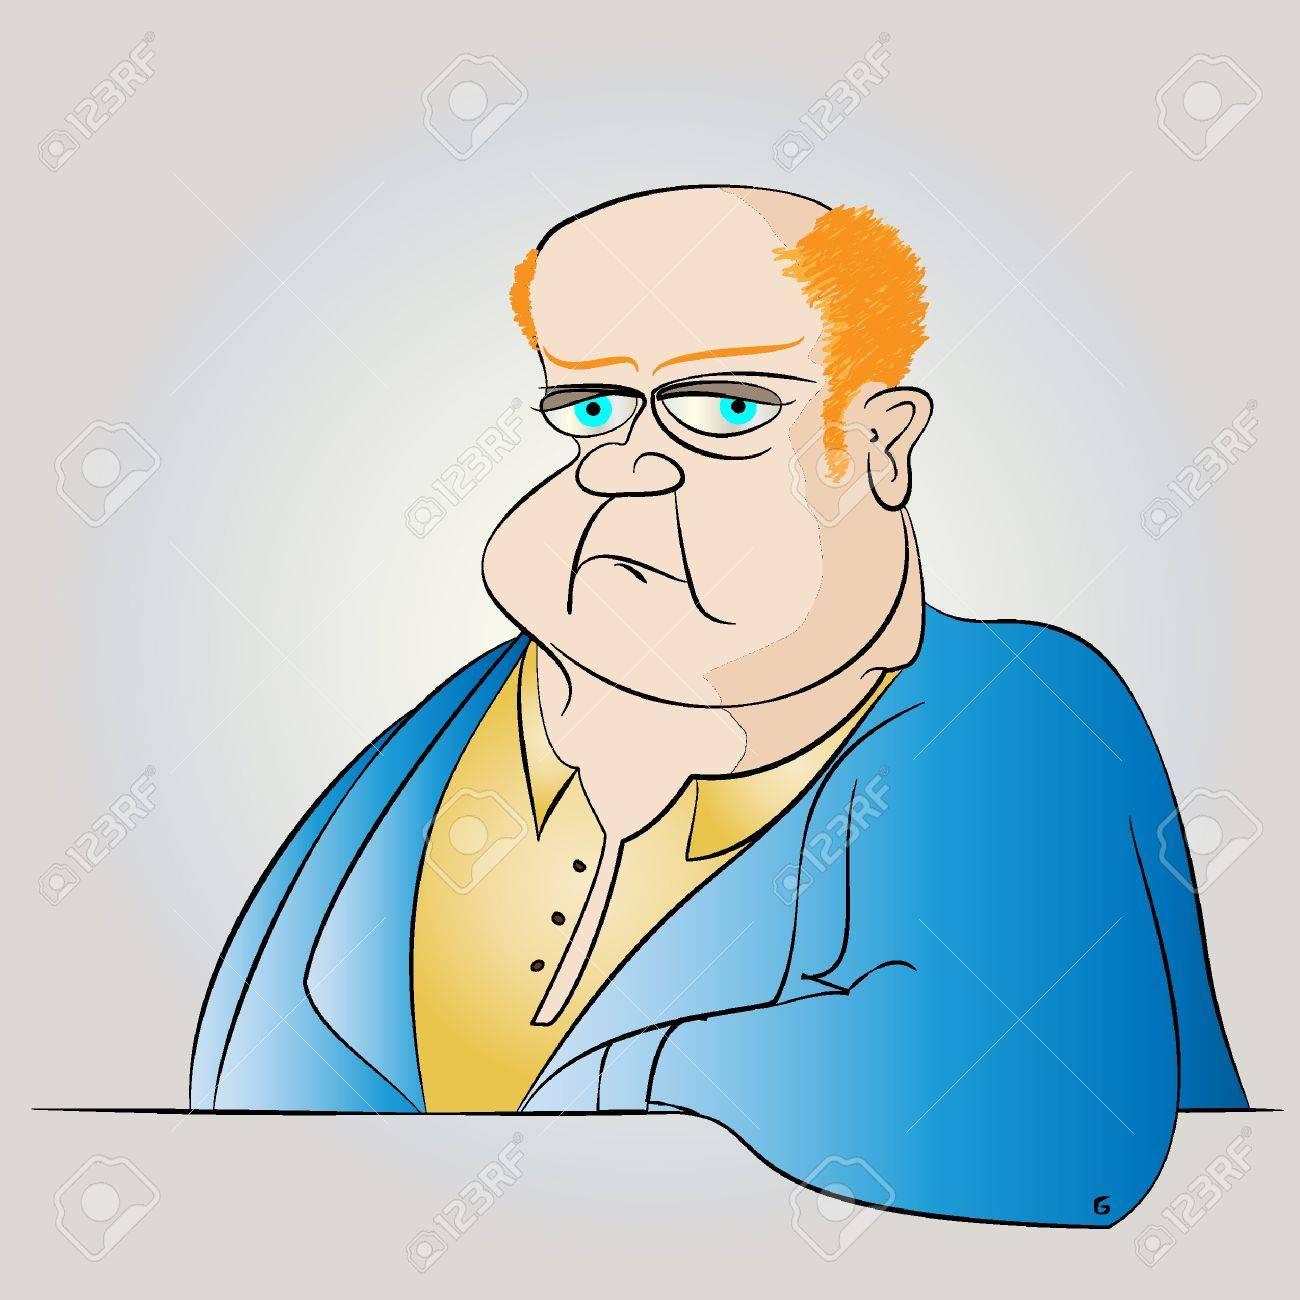 Fat Man in a Suit Vector Stock Vector - 10927690